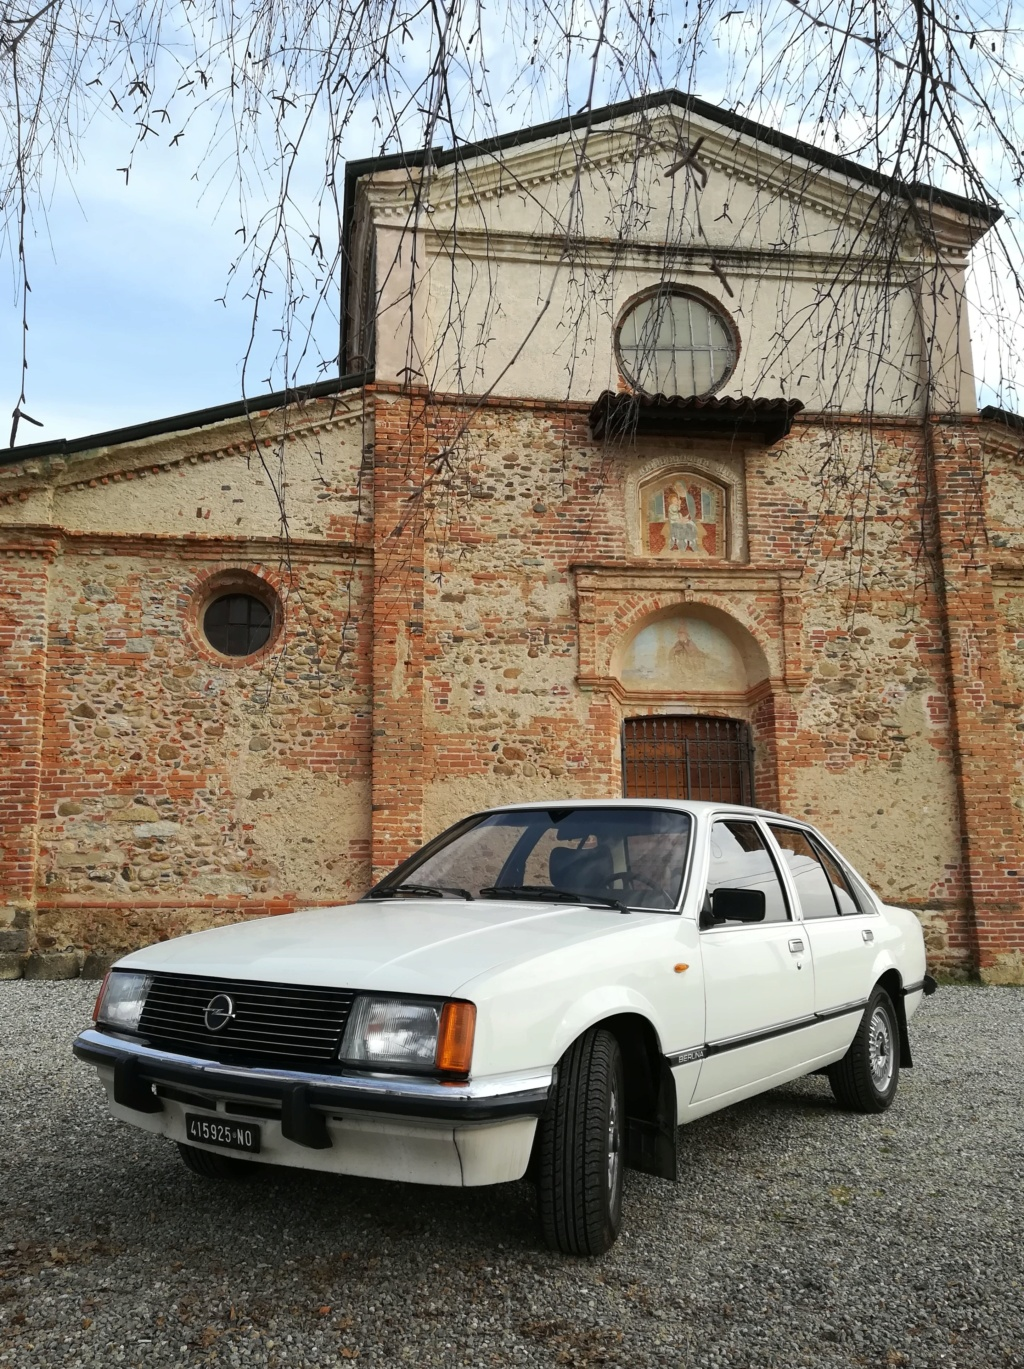 Opel Rekord E1 2.0 E Berlina (1980).... dopo la Vanda arriva... Miranda! Img_2354